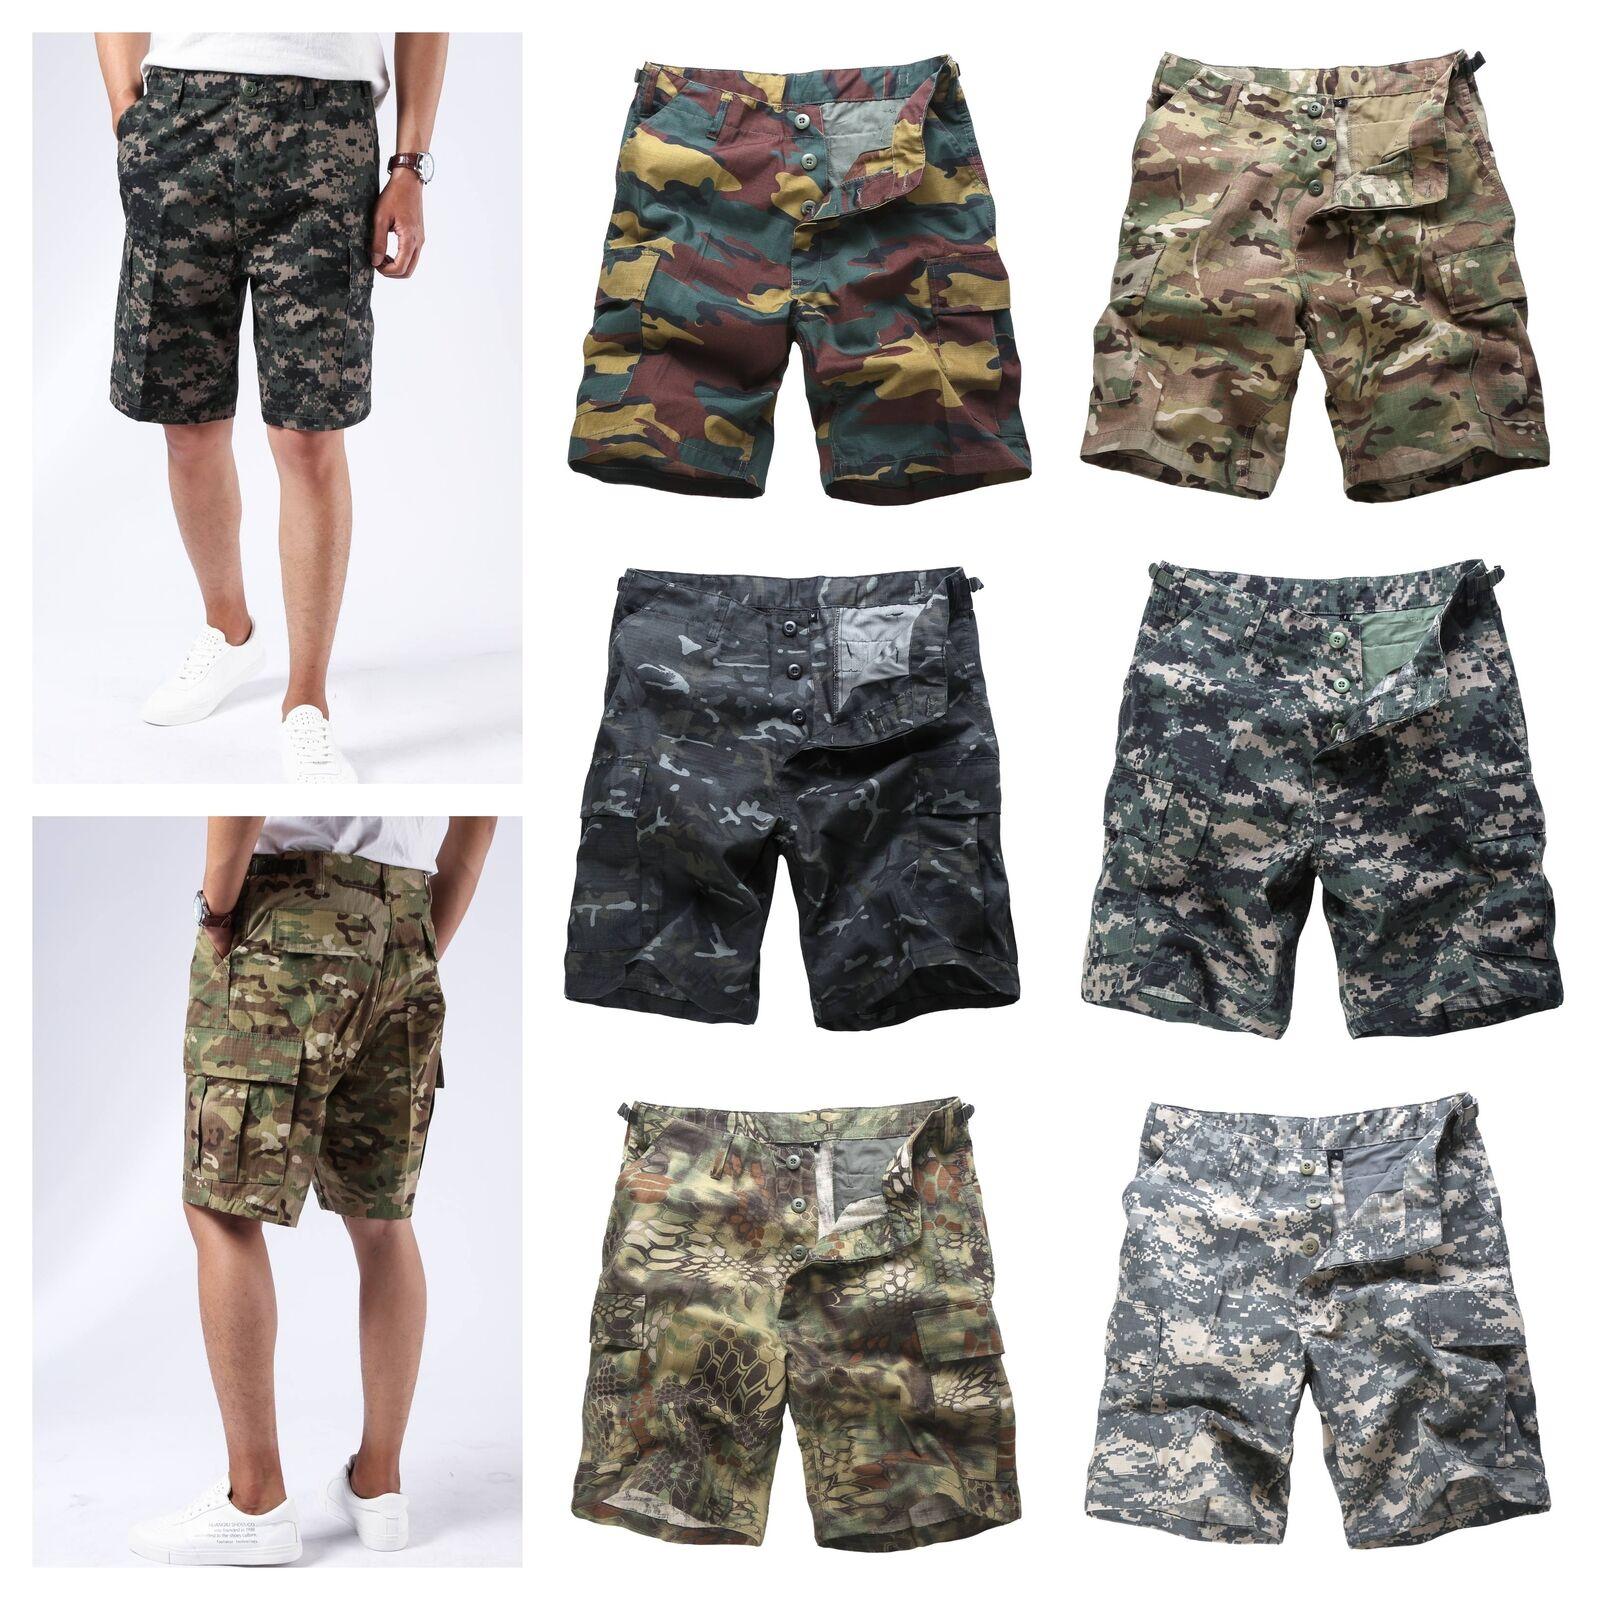 Mens Army Military Combat Camo Shorts Fashion Cargo Shorts Camping Work Fishing